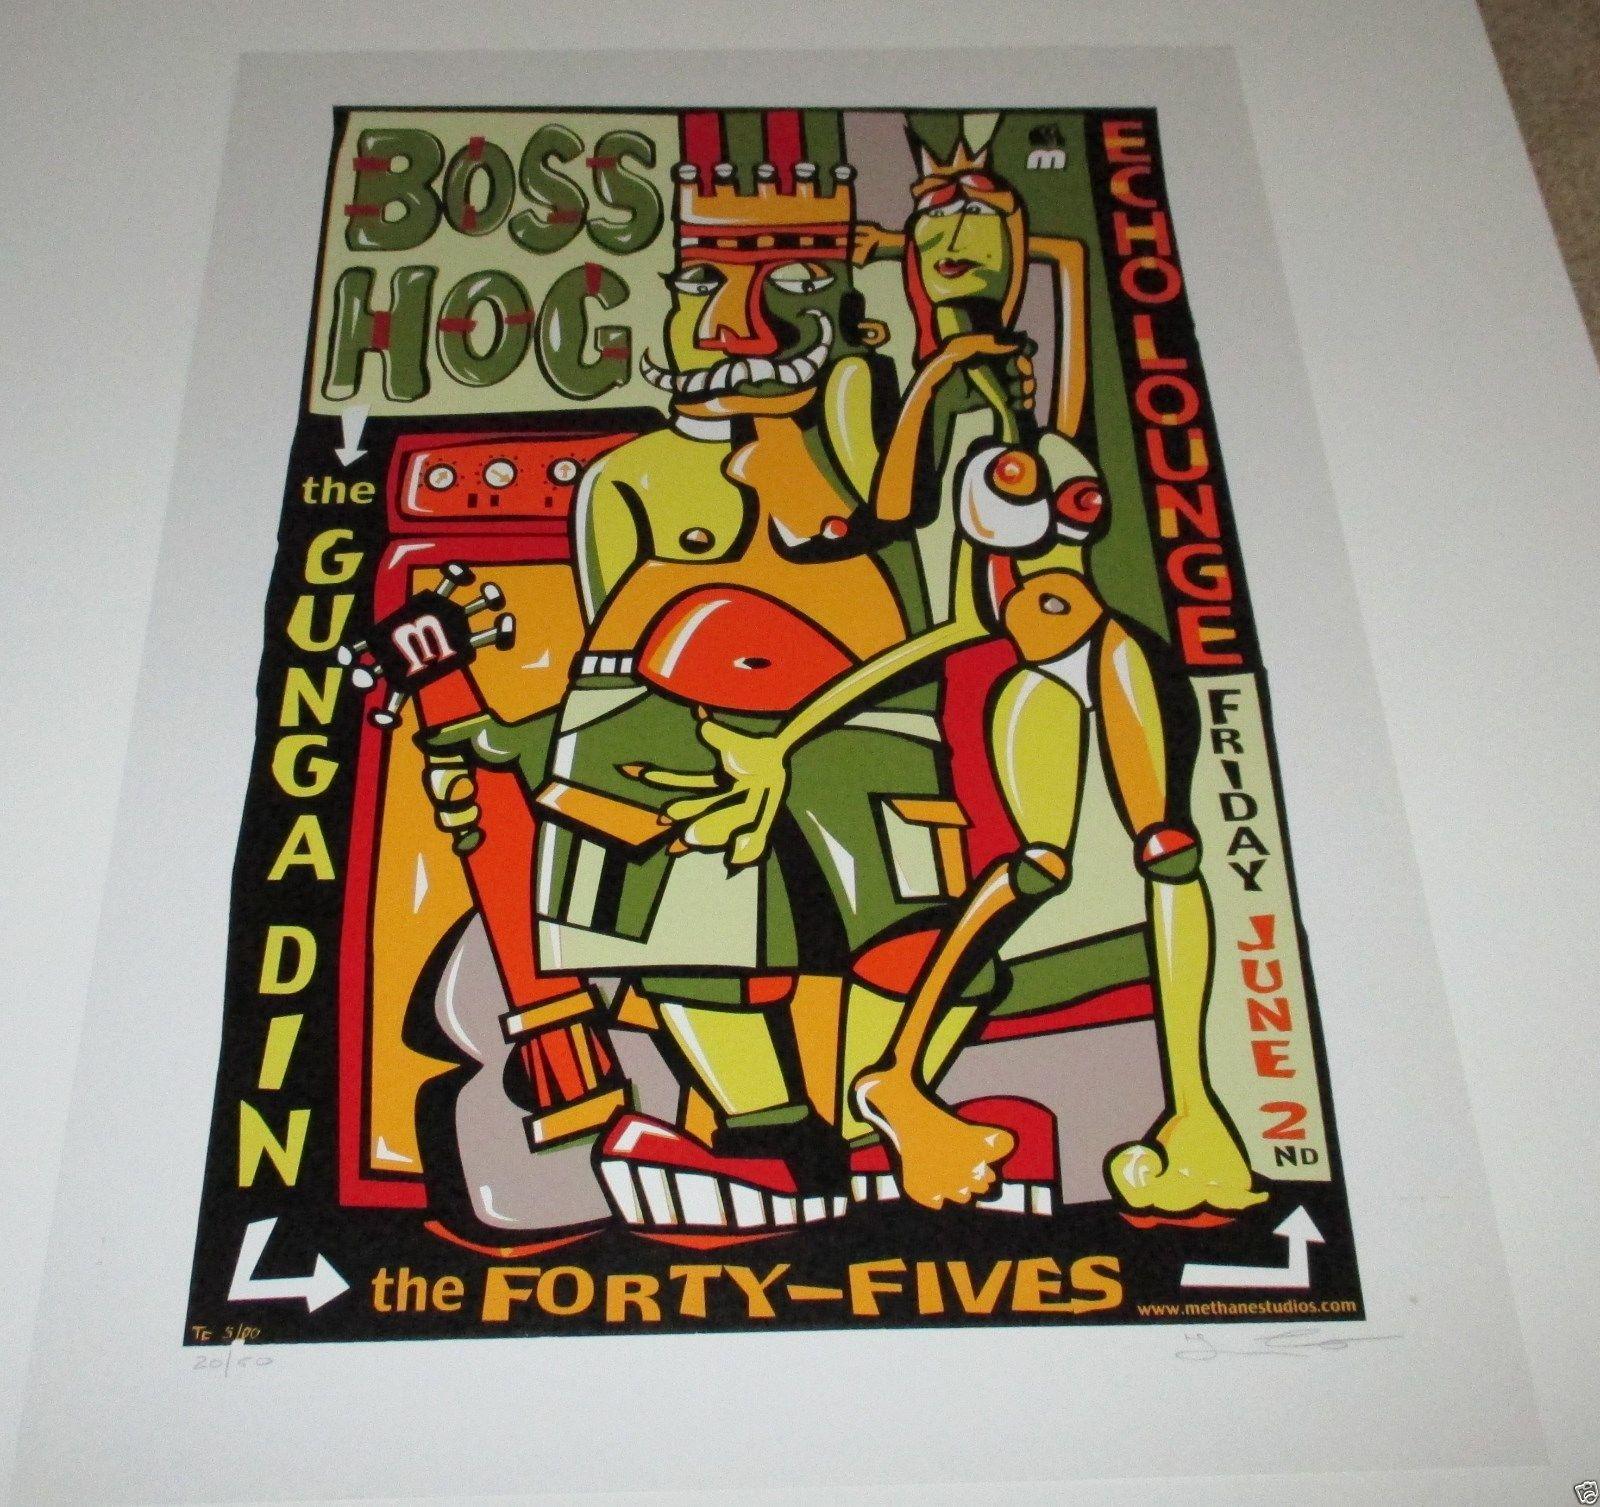 Boss Hog - Echo Lounge, Atlanta, GA, US (2 June 2000)